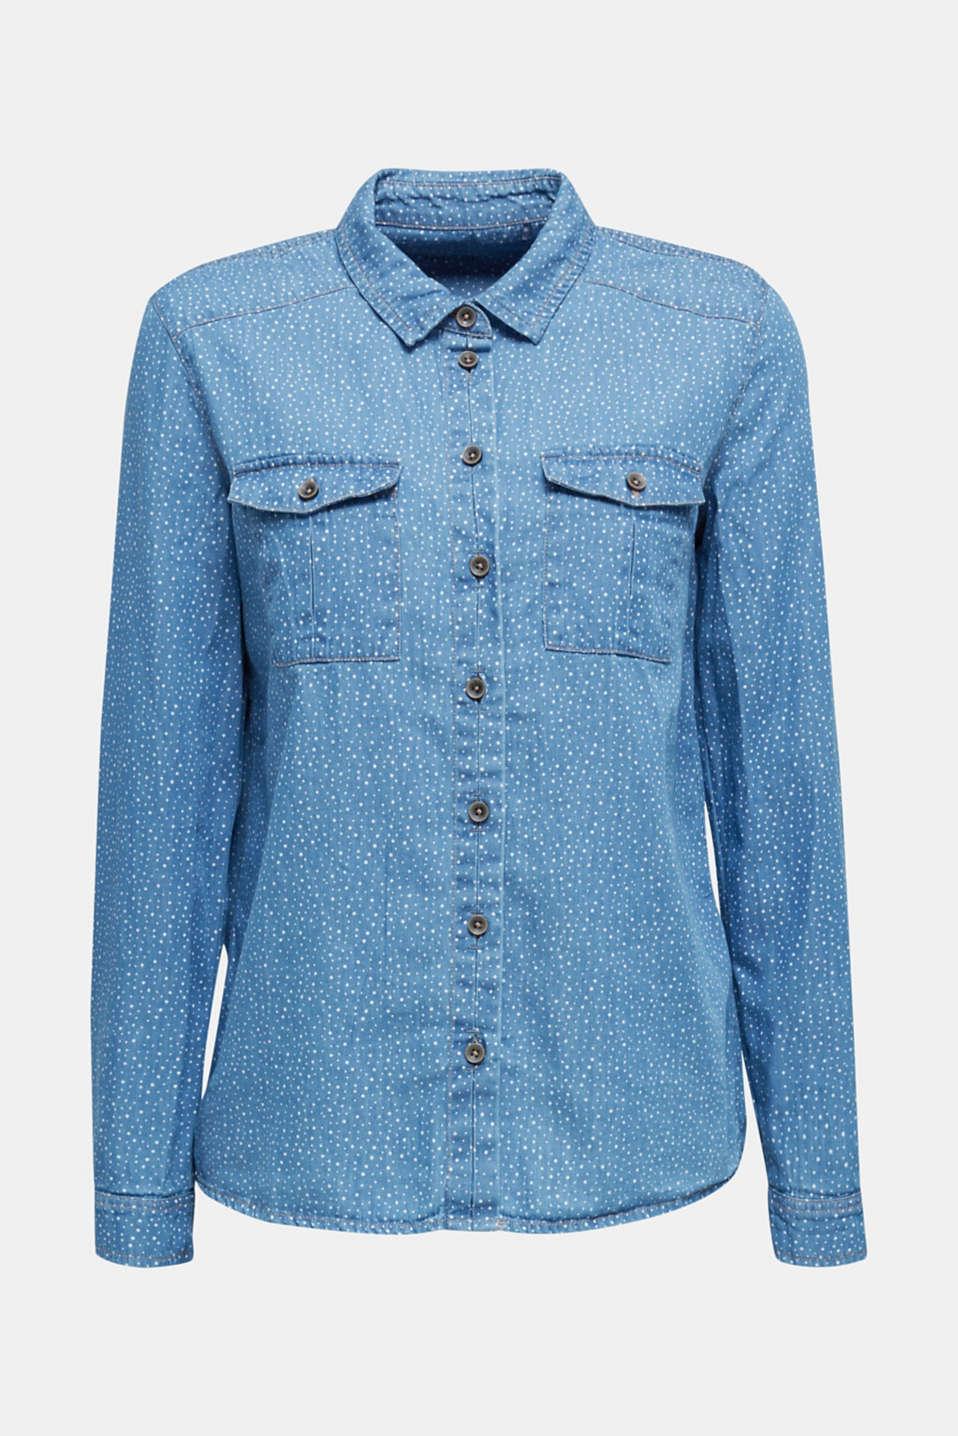 Printed denim blouse, 100% cotton, BLUE LIGHT WASH, detail image number 5